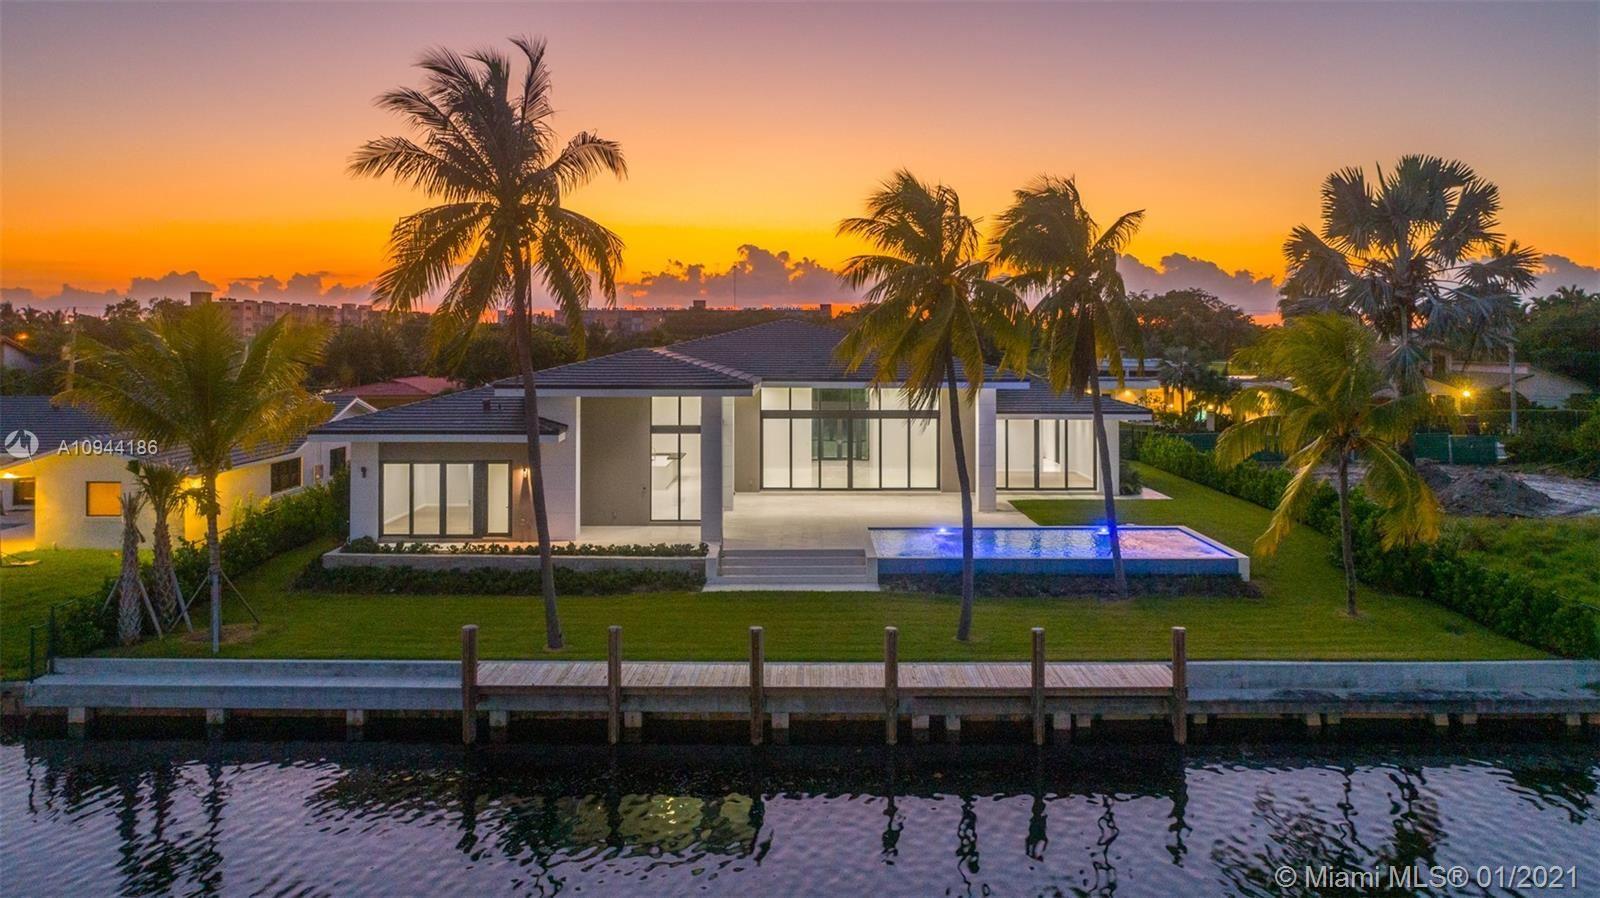 1651 Diplomat Pkwy, Hallandale Beach, FL 33009 - #: A10944186